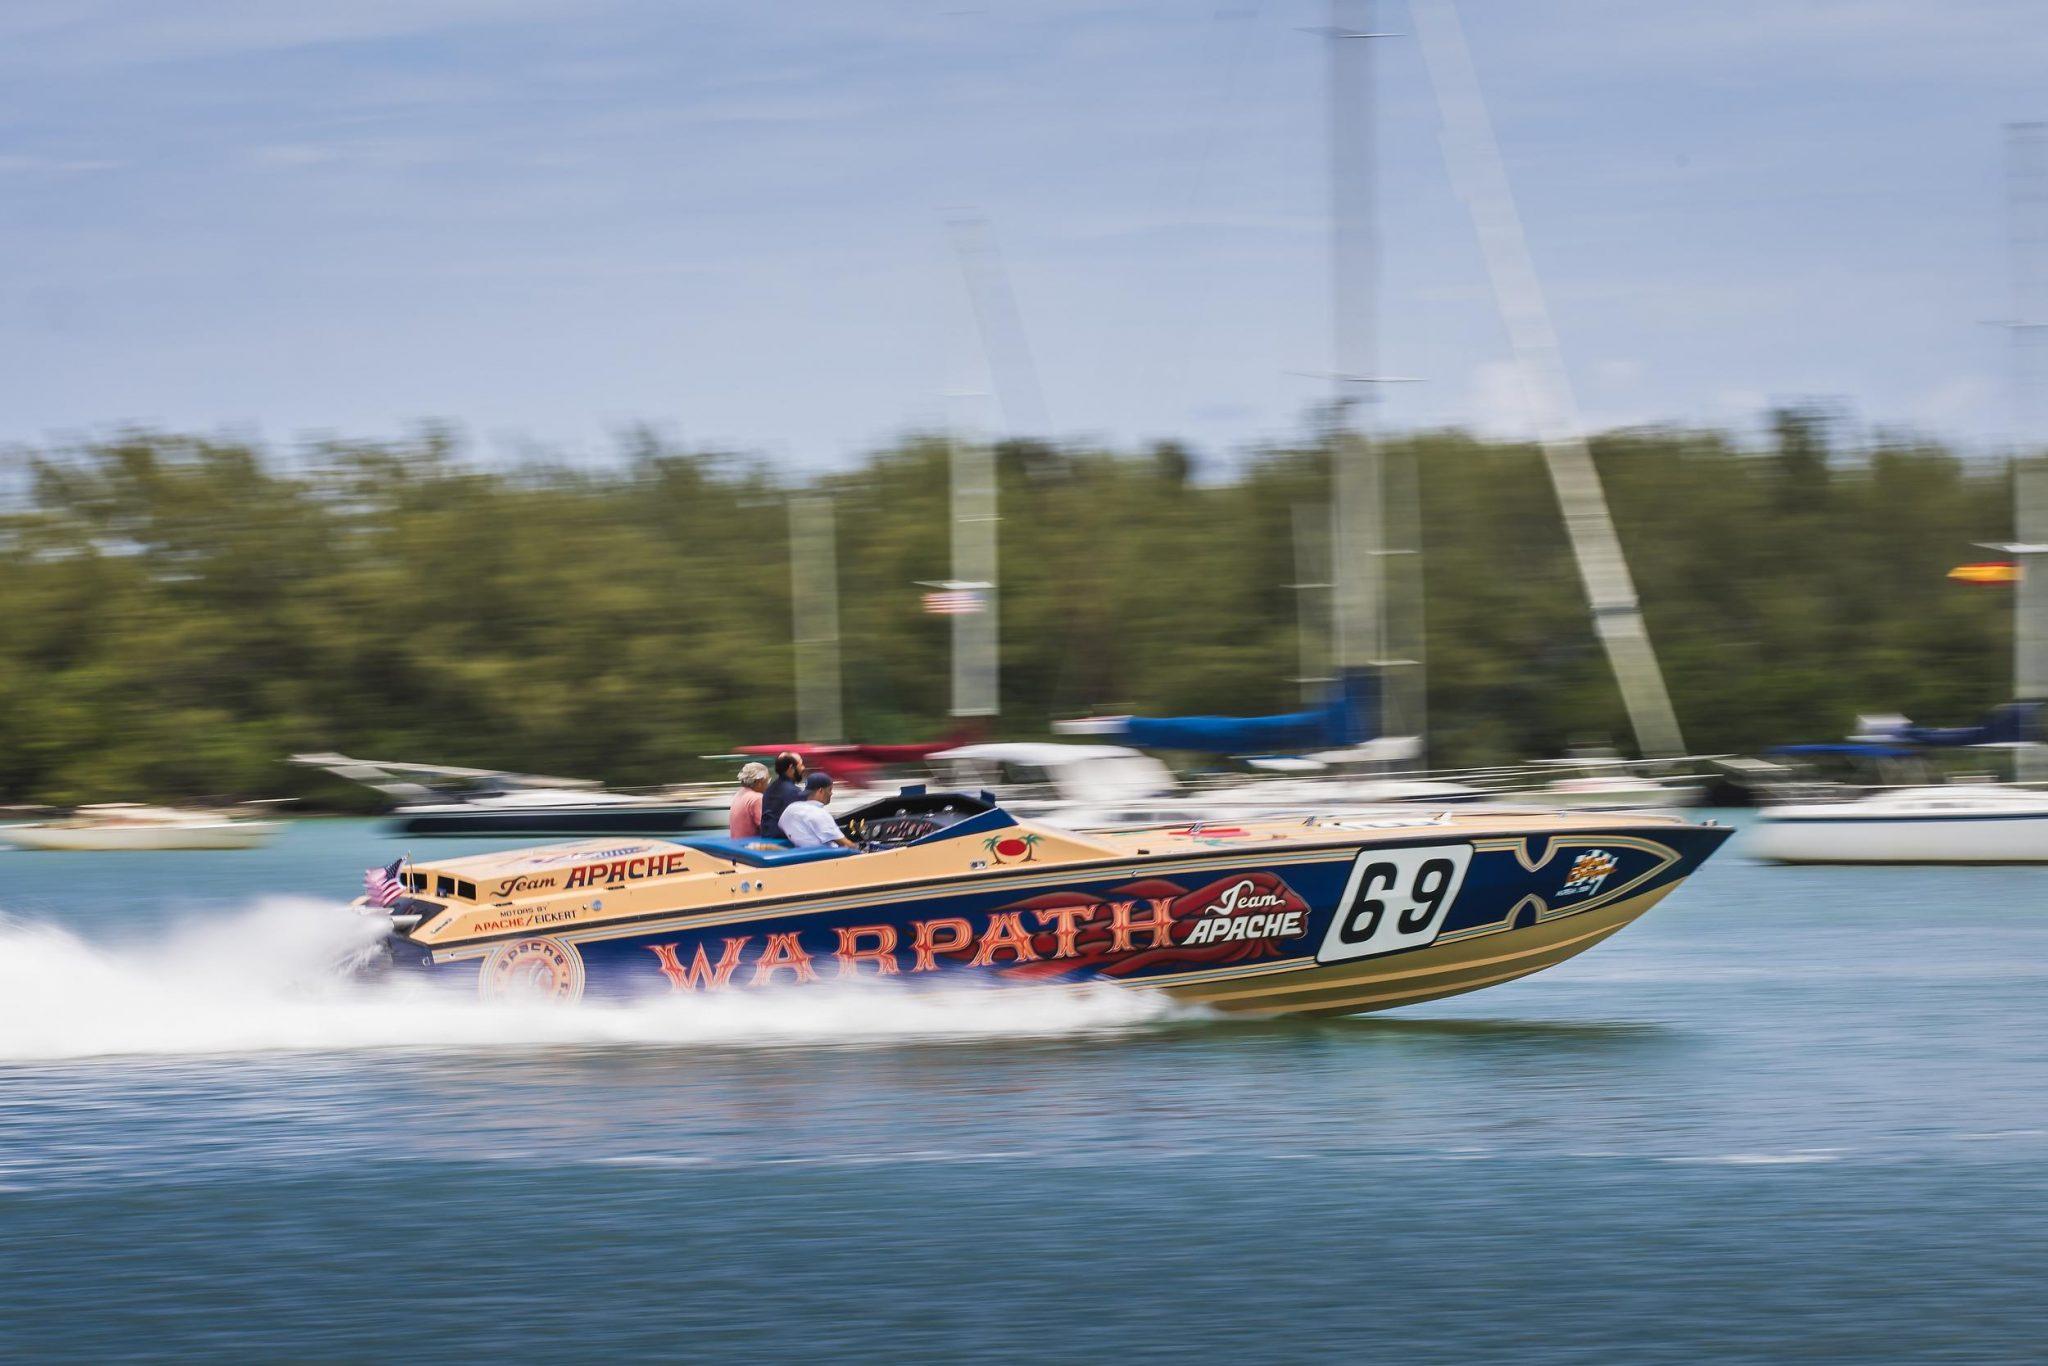 1984 Apache Offshore Powerboat Warpath running